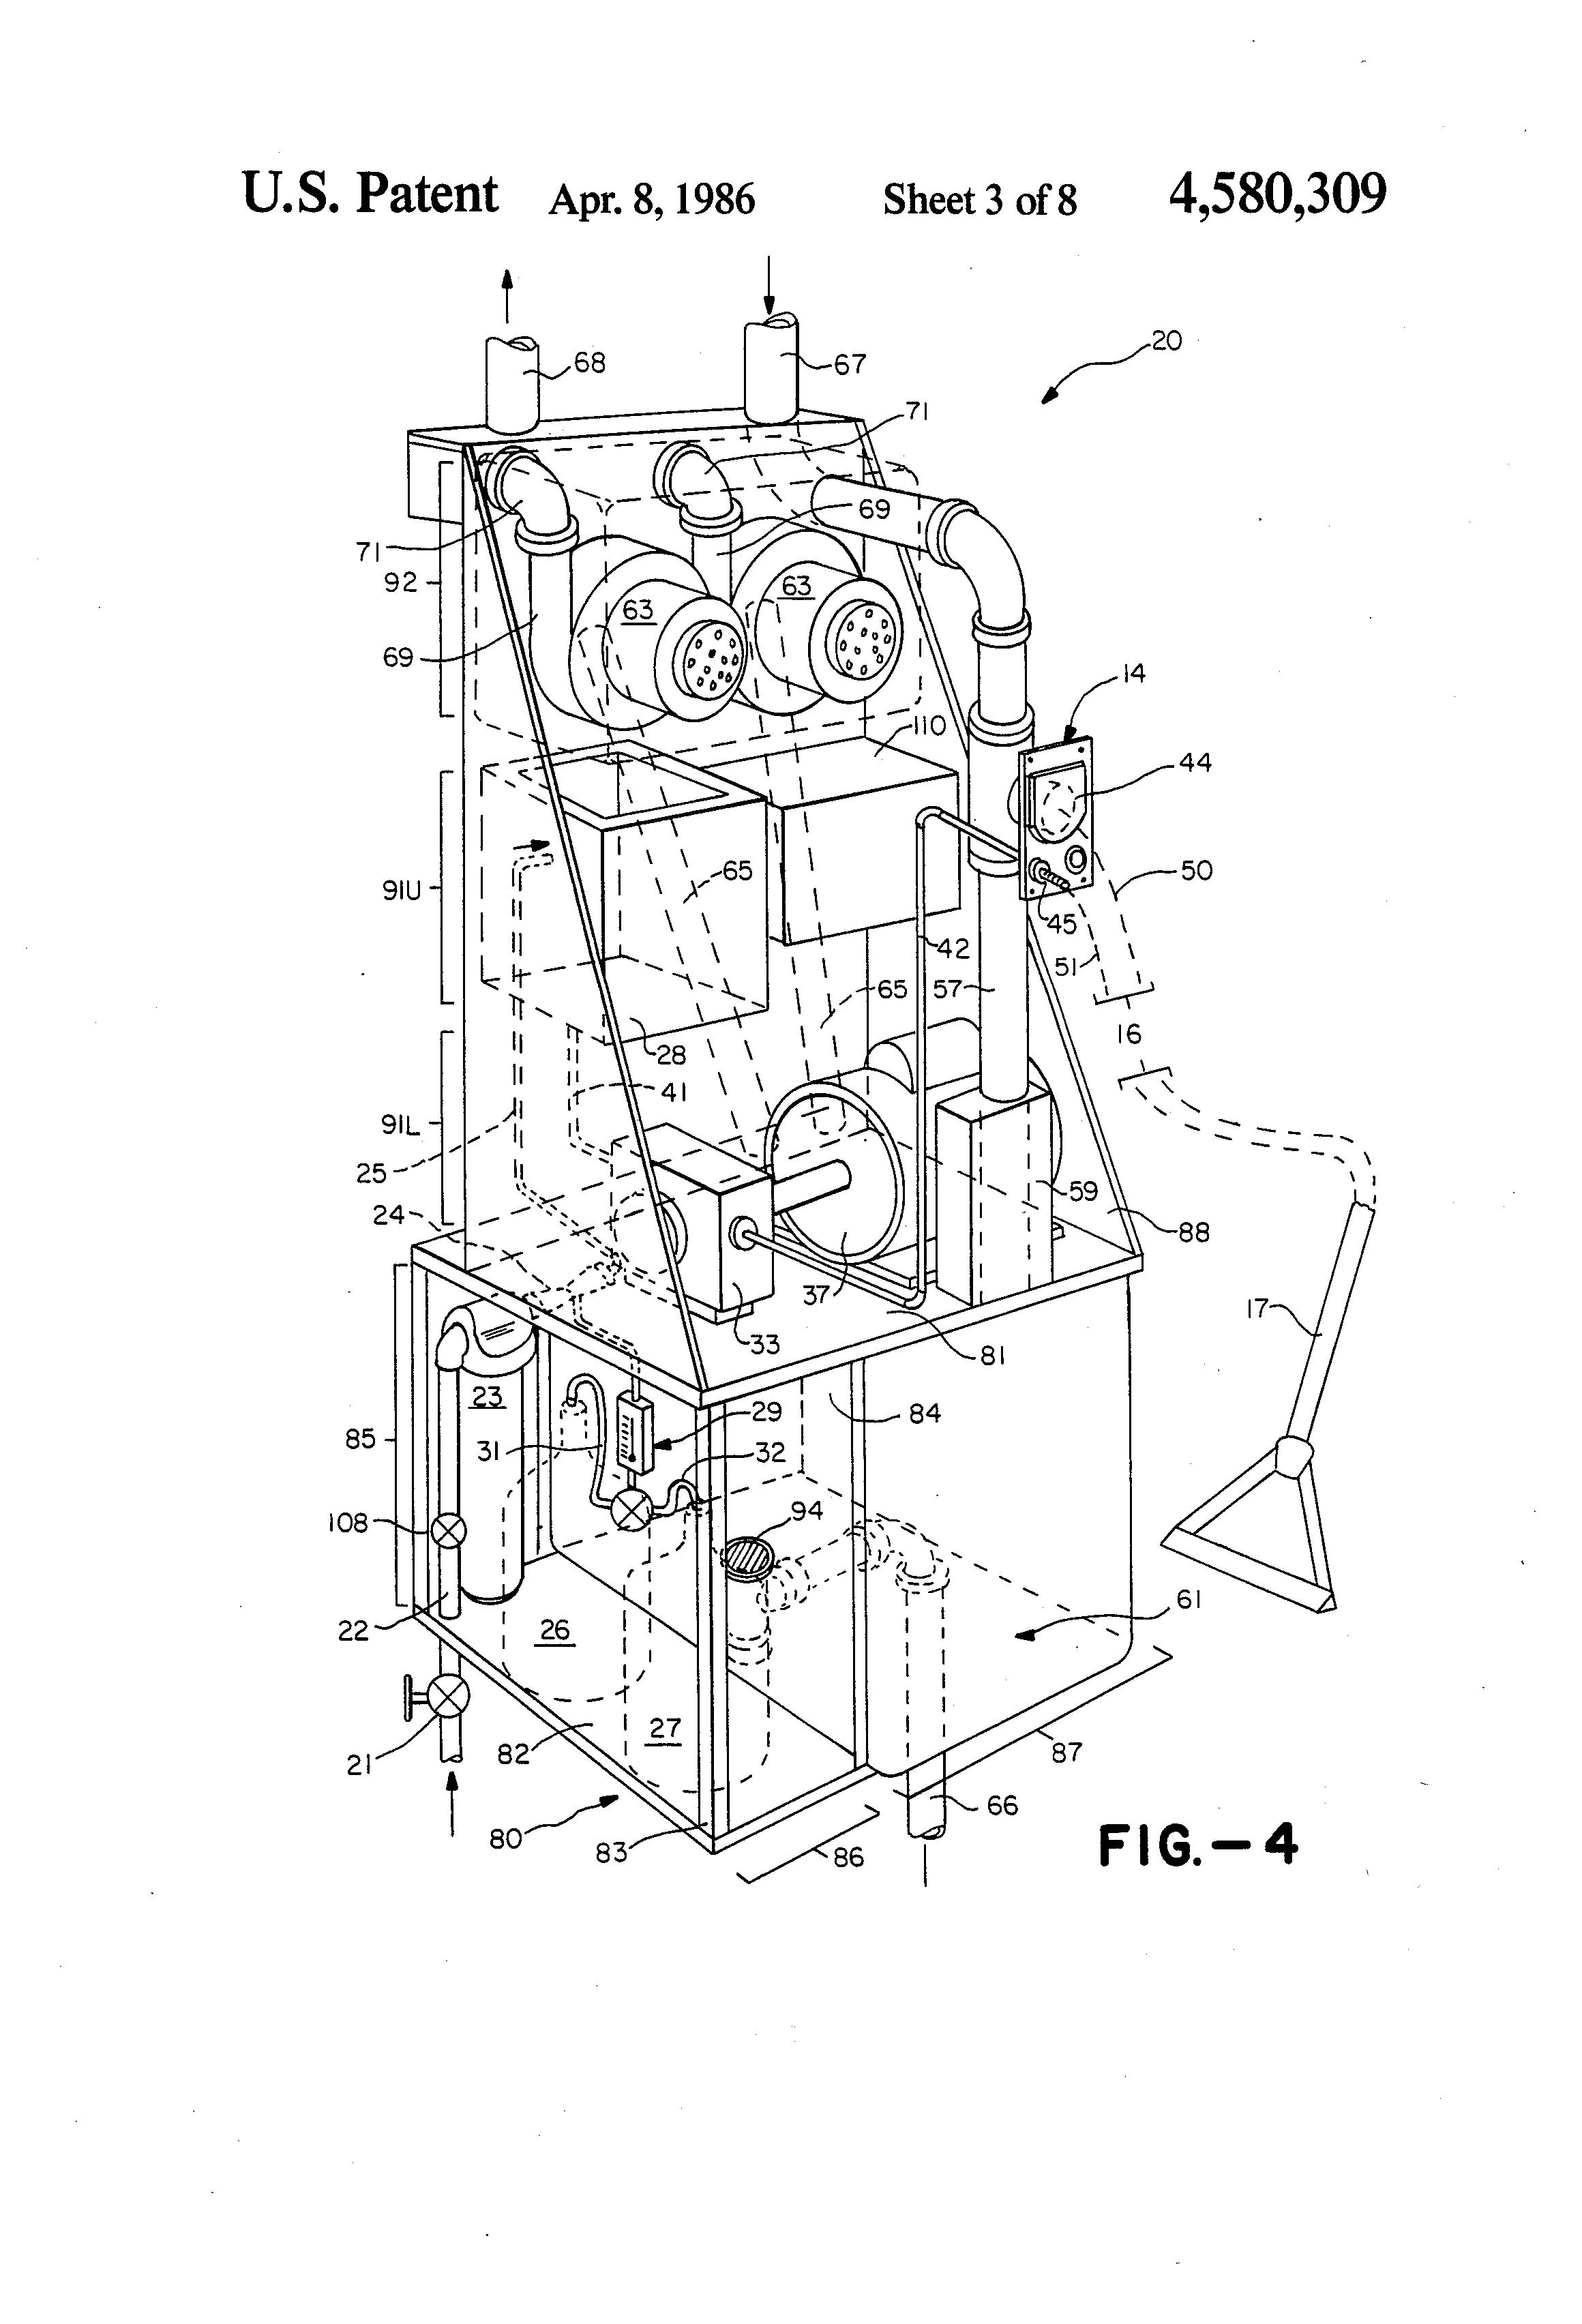 Dyson Dc04 Wiring Diagram